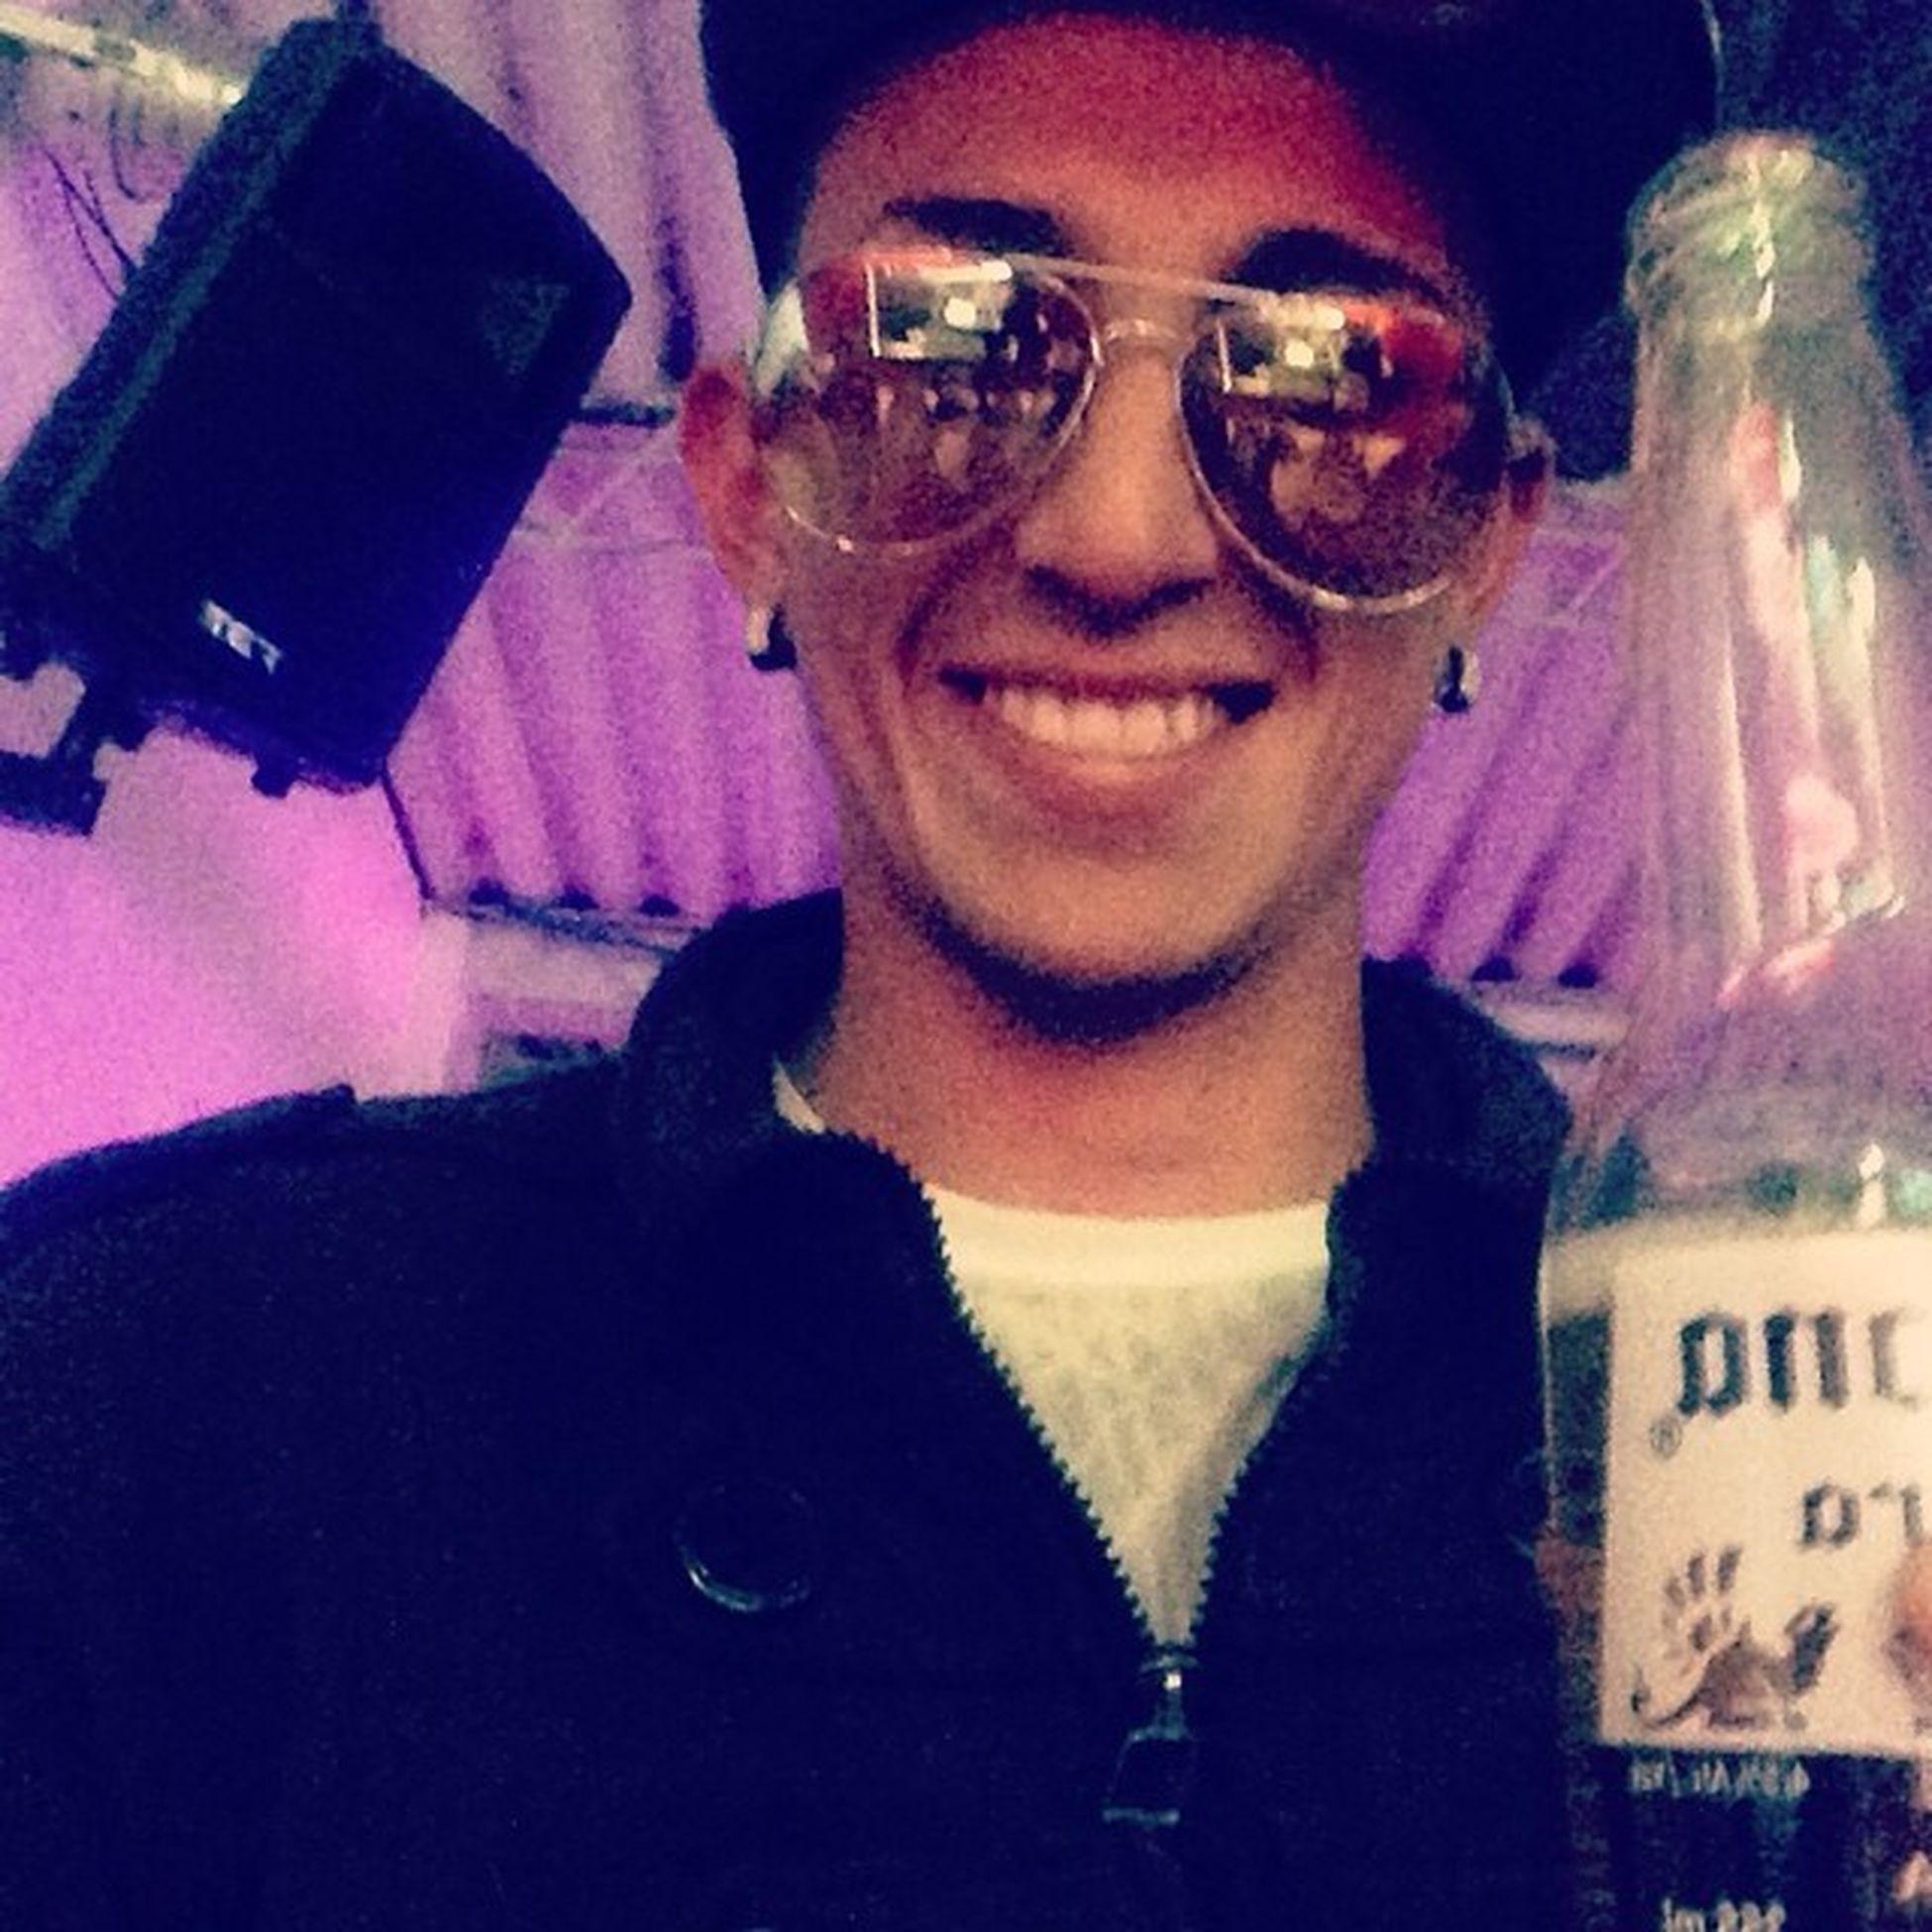 Happy Smille Music Urban Reggaeton  Bogotaenlacasa Colombia Coronas Celebrity Heavy Drink Bogotacity Friday Oxigeno1004 Bogopauta Colombiagana Likegram